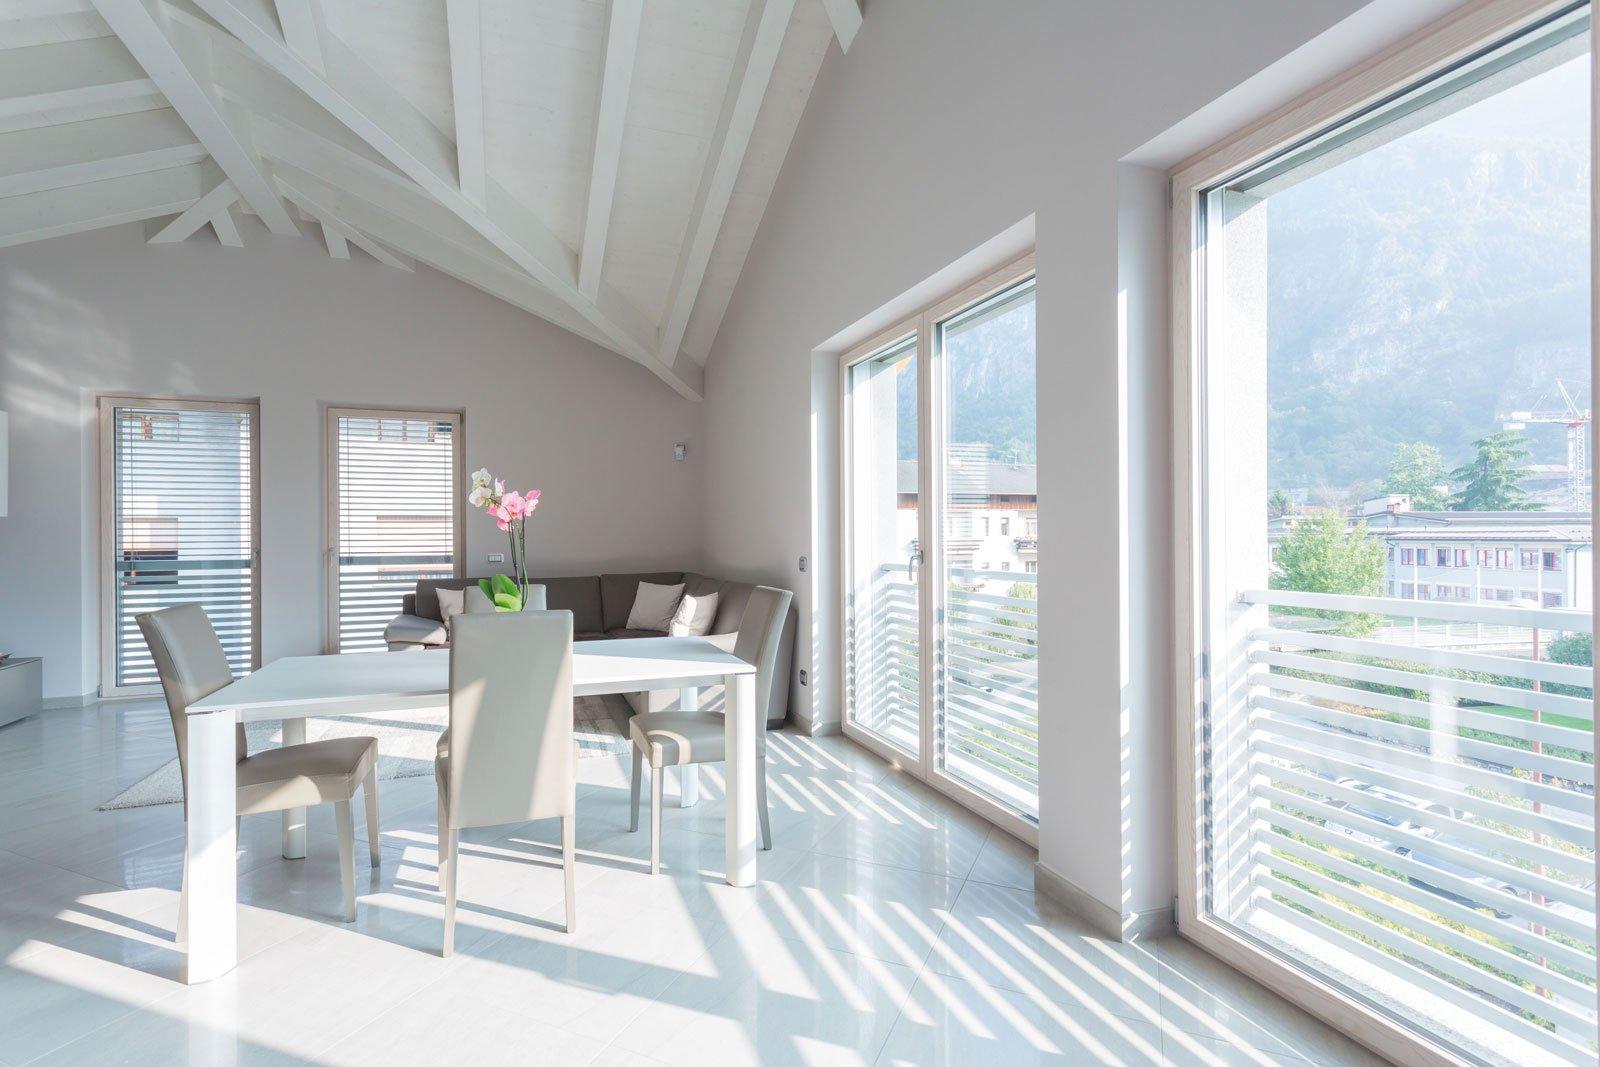 La posa in opera dei serramenti a regola d arte cose di casa - Immagini finestre in pvc ...